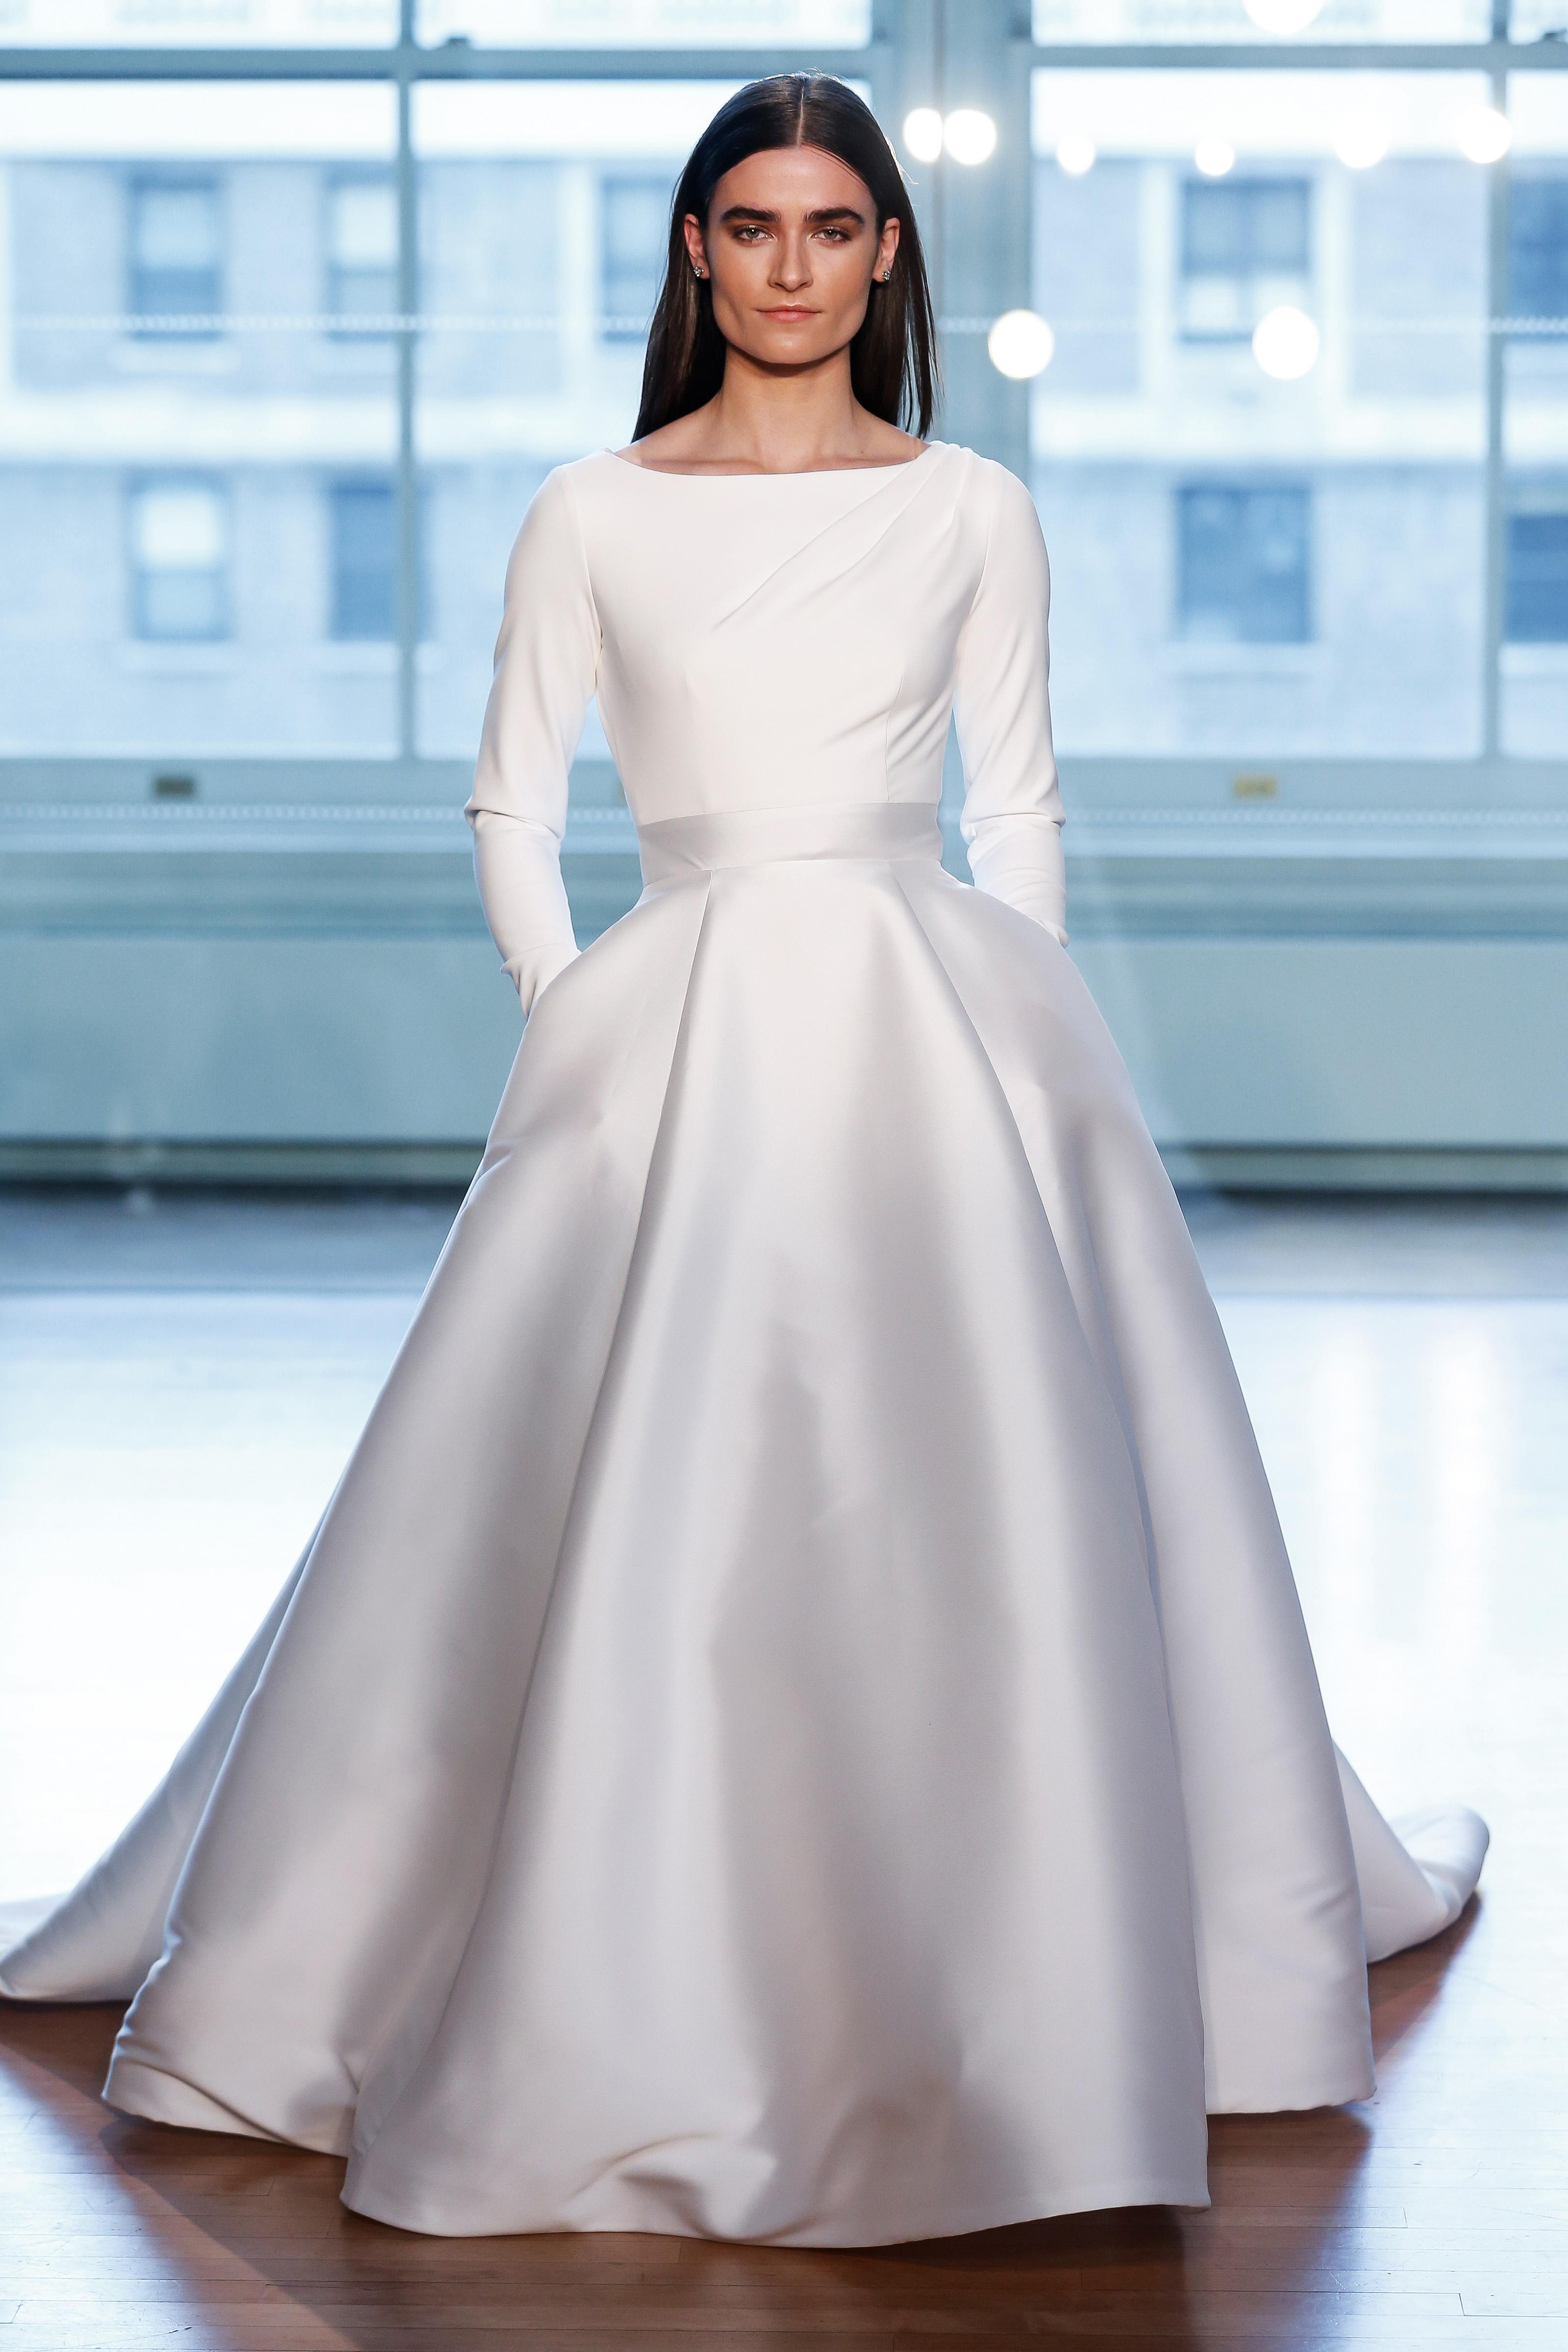 justin alexander wedding dress spring 2019 ball gown long sleeves